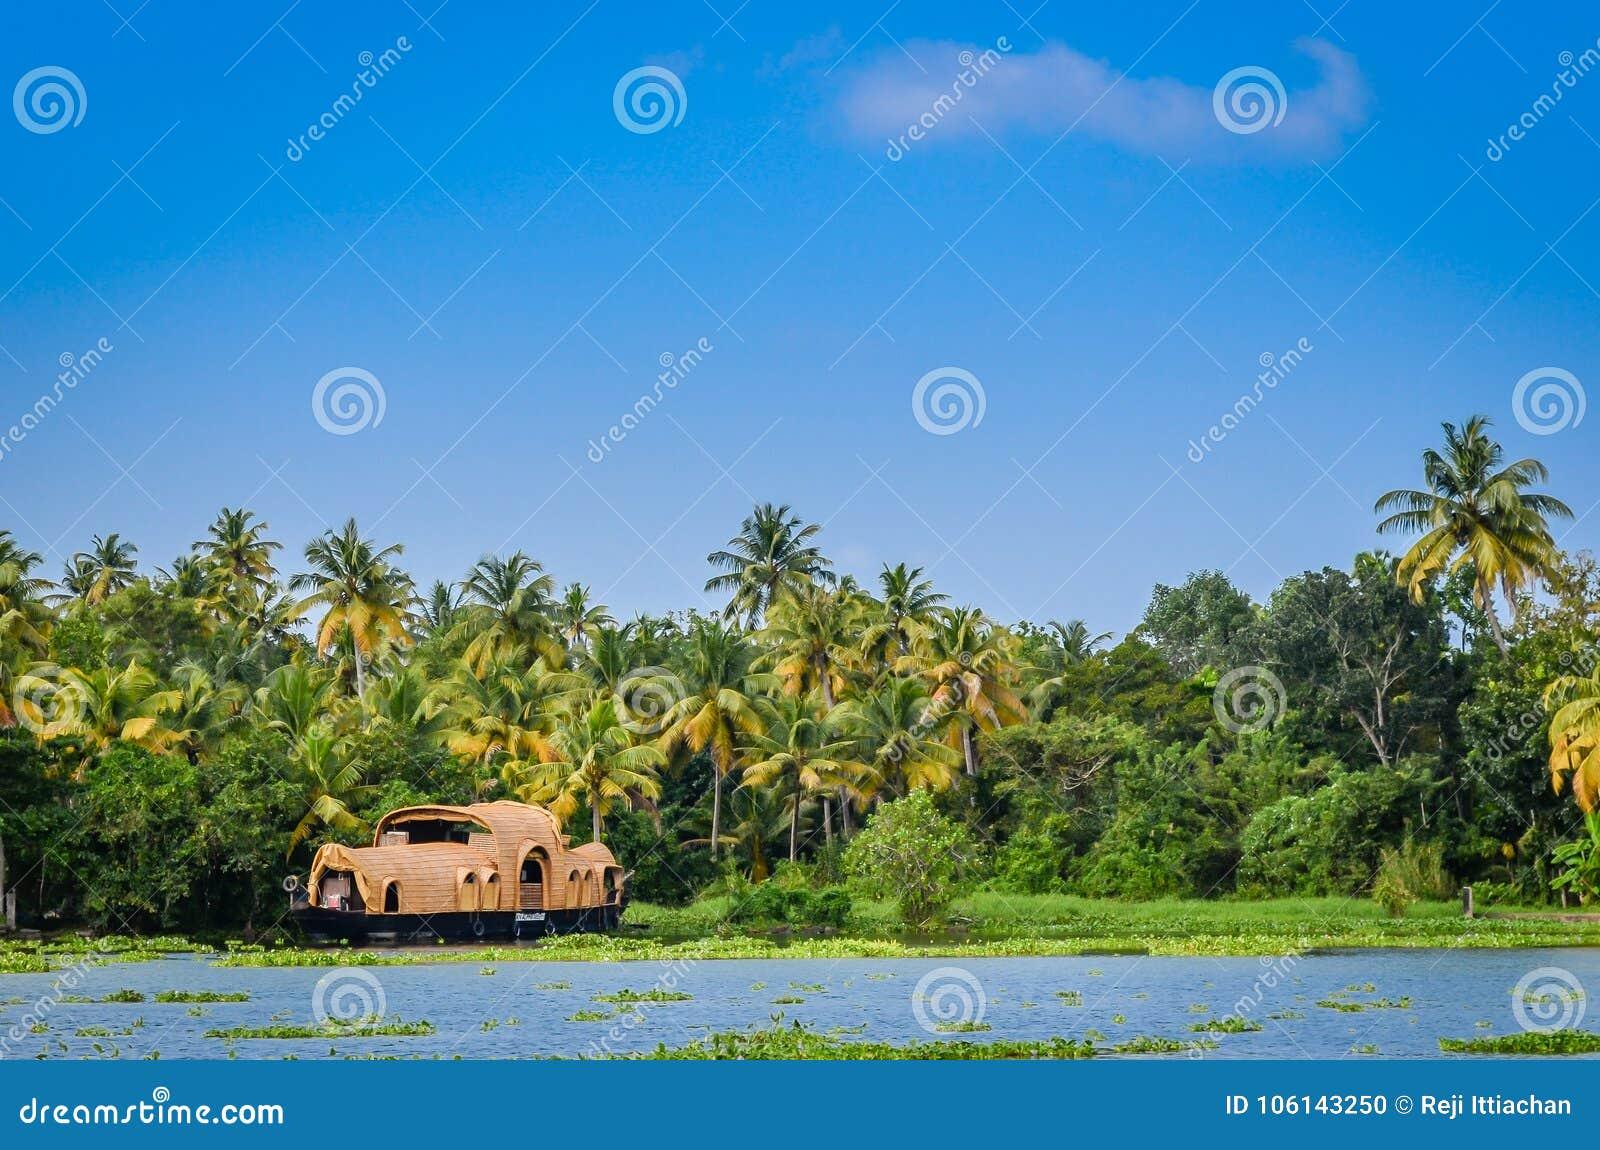 Houseboat στα τέλματα του Κεράλα ενάντια στην παχιά πρασινάδα και ένα β